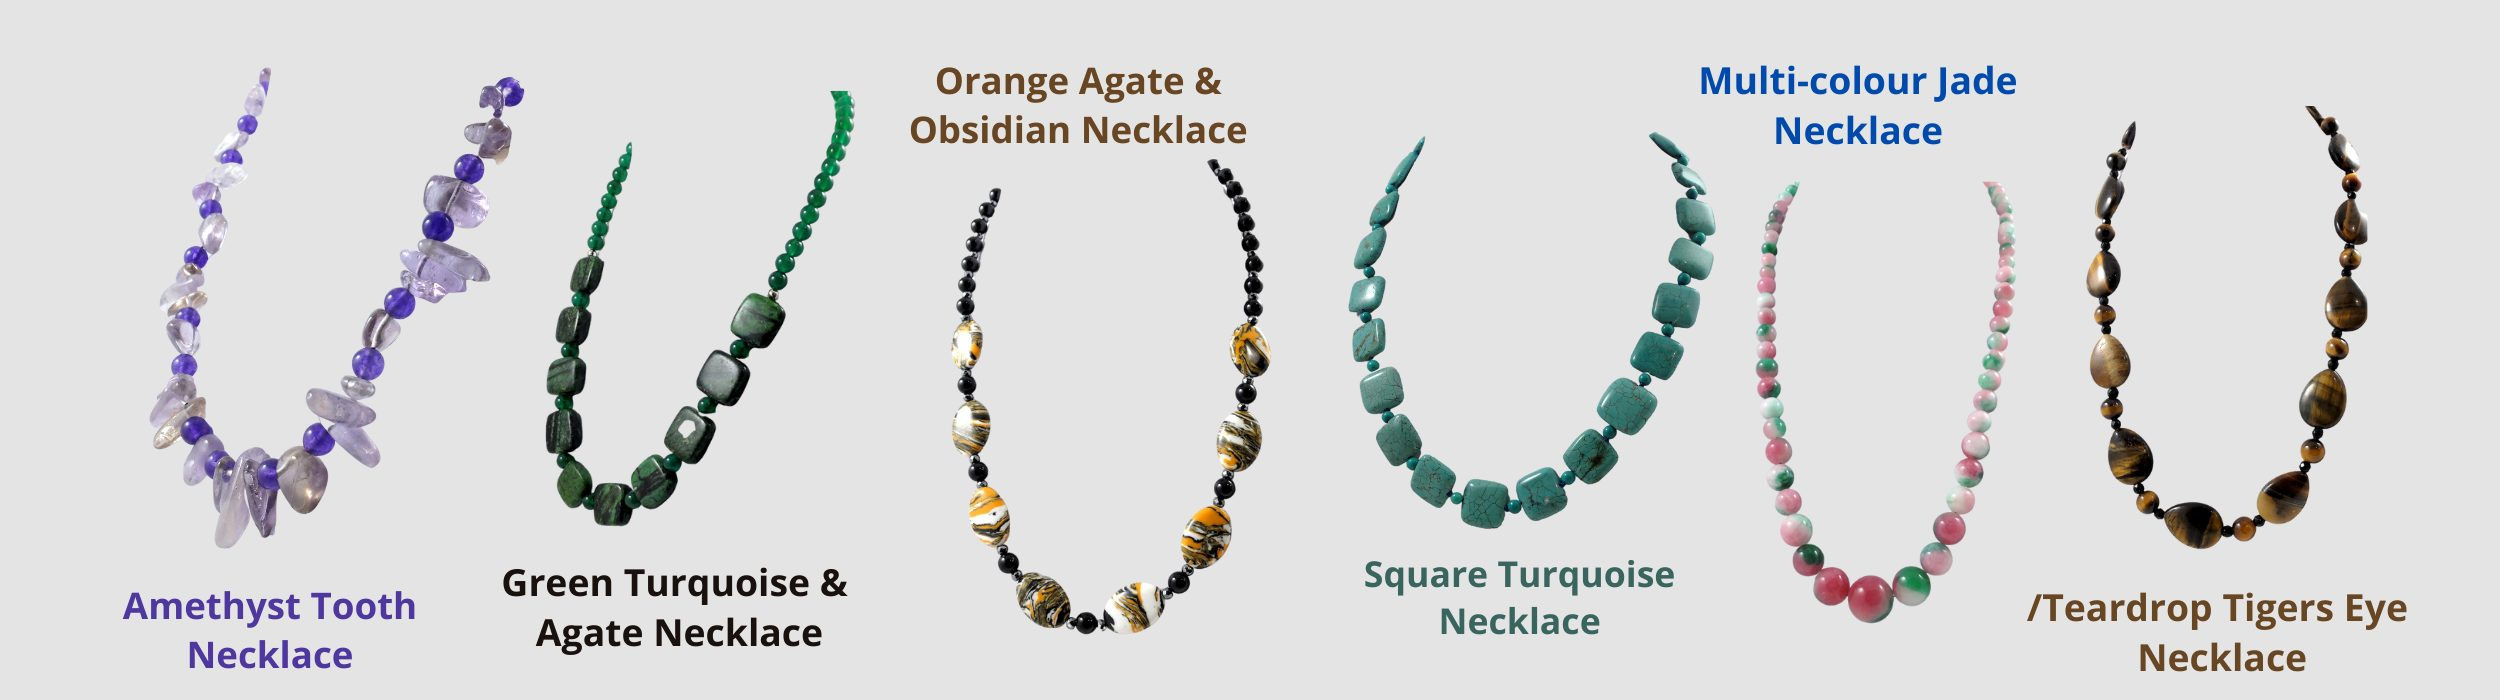 Medium size gemstone necklaces